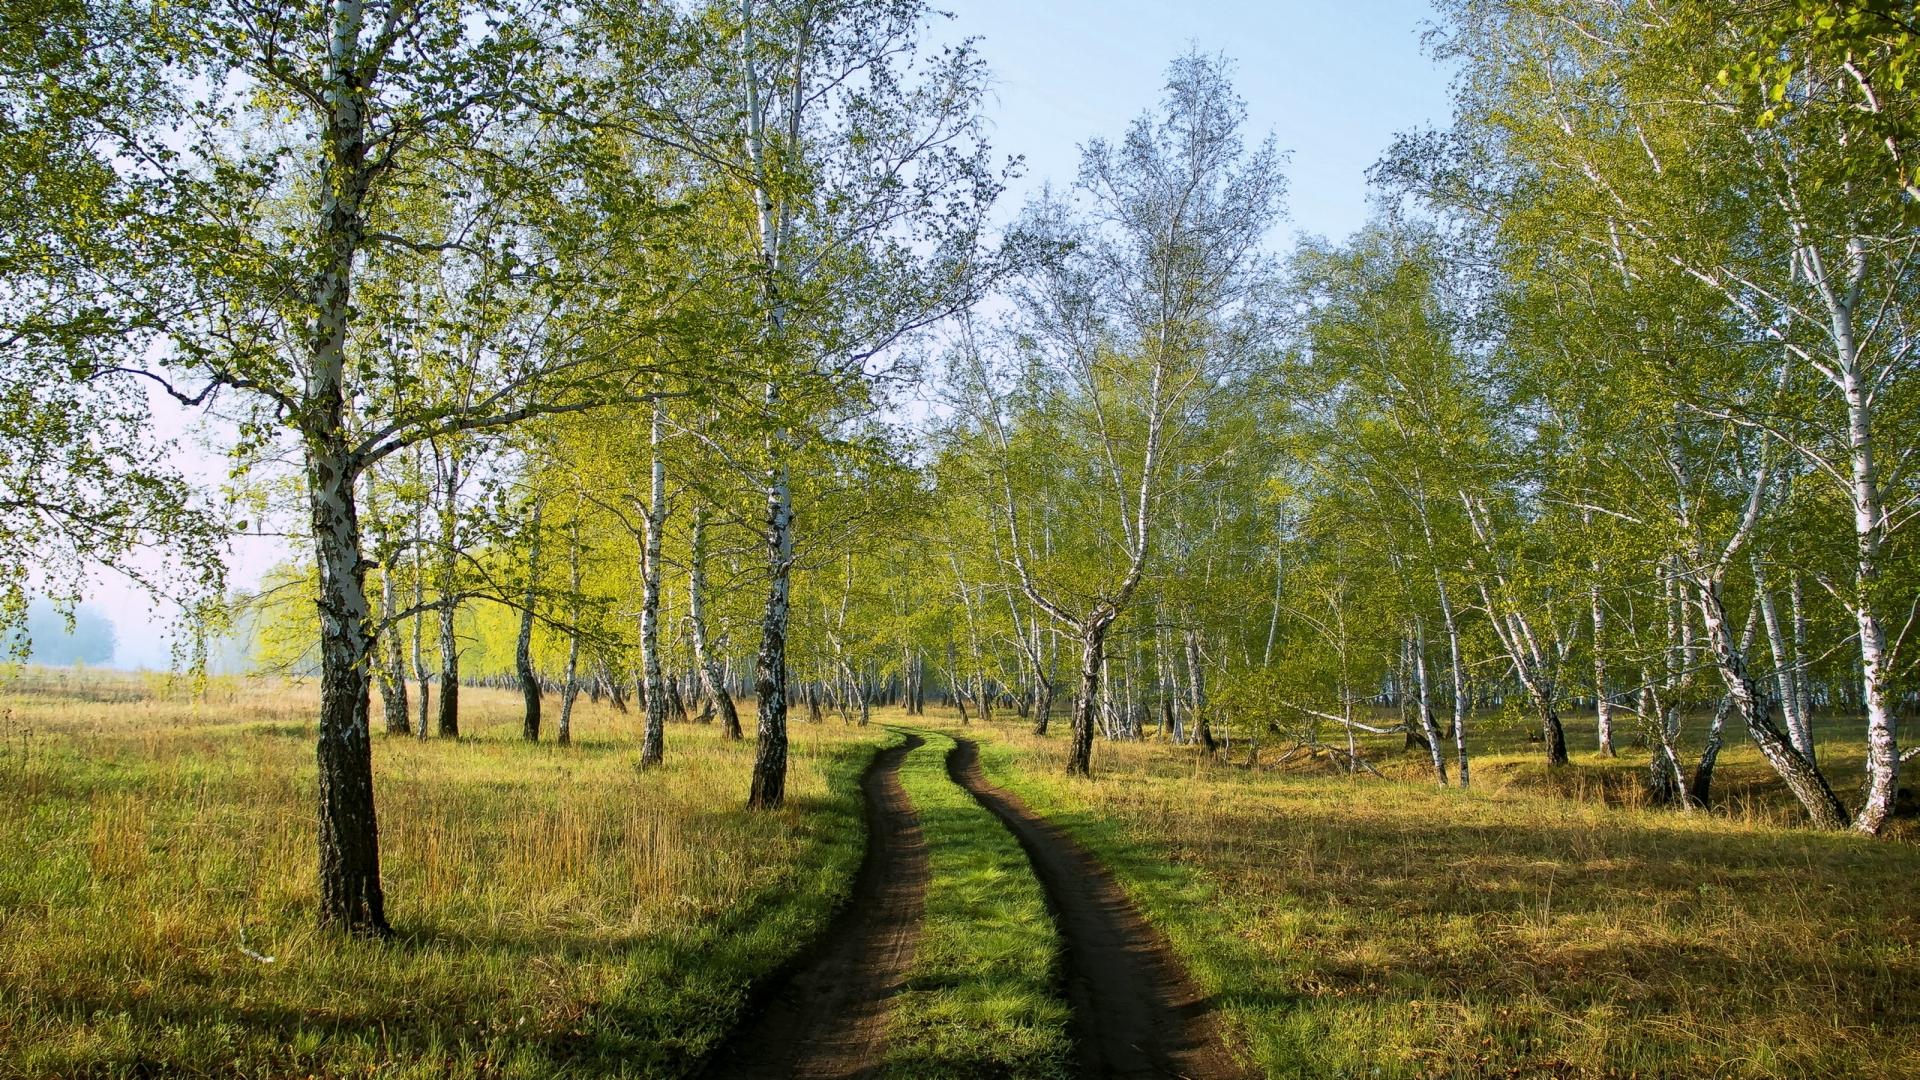 Дорога березы аллея бесплатно